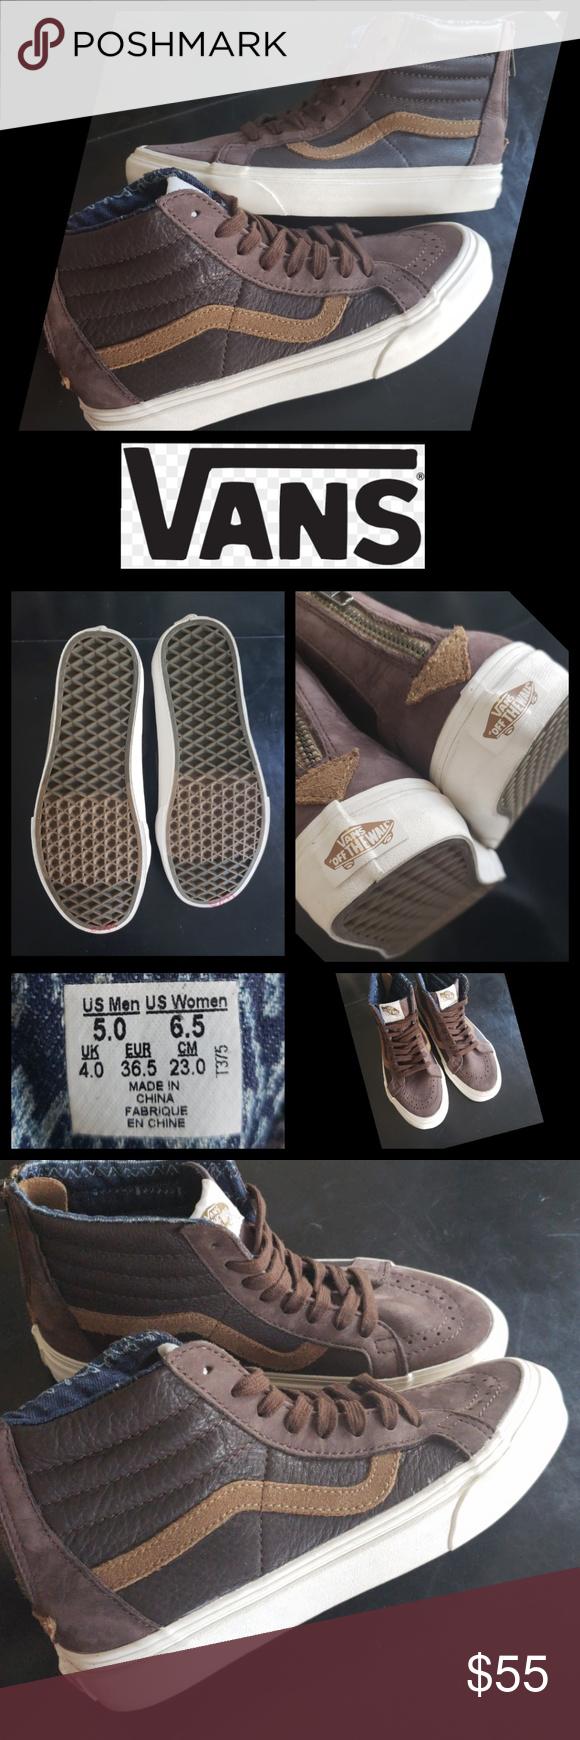 1e4c6dfd95f2 Vans RARE Sk8-Hi Brown Zip back Hi Tops Mens 5 Rare - Vans - Mens 5 --  Womens 6.5 Brand New w o tags - Clean - never worn Vans Shoes Sneakers